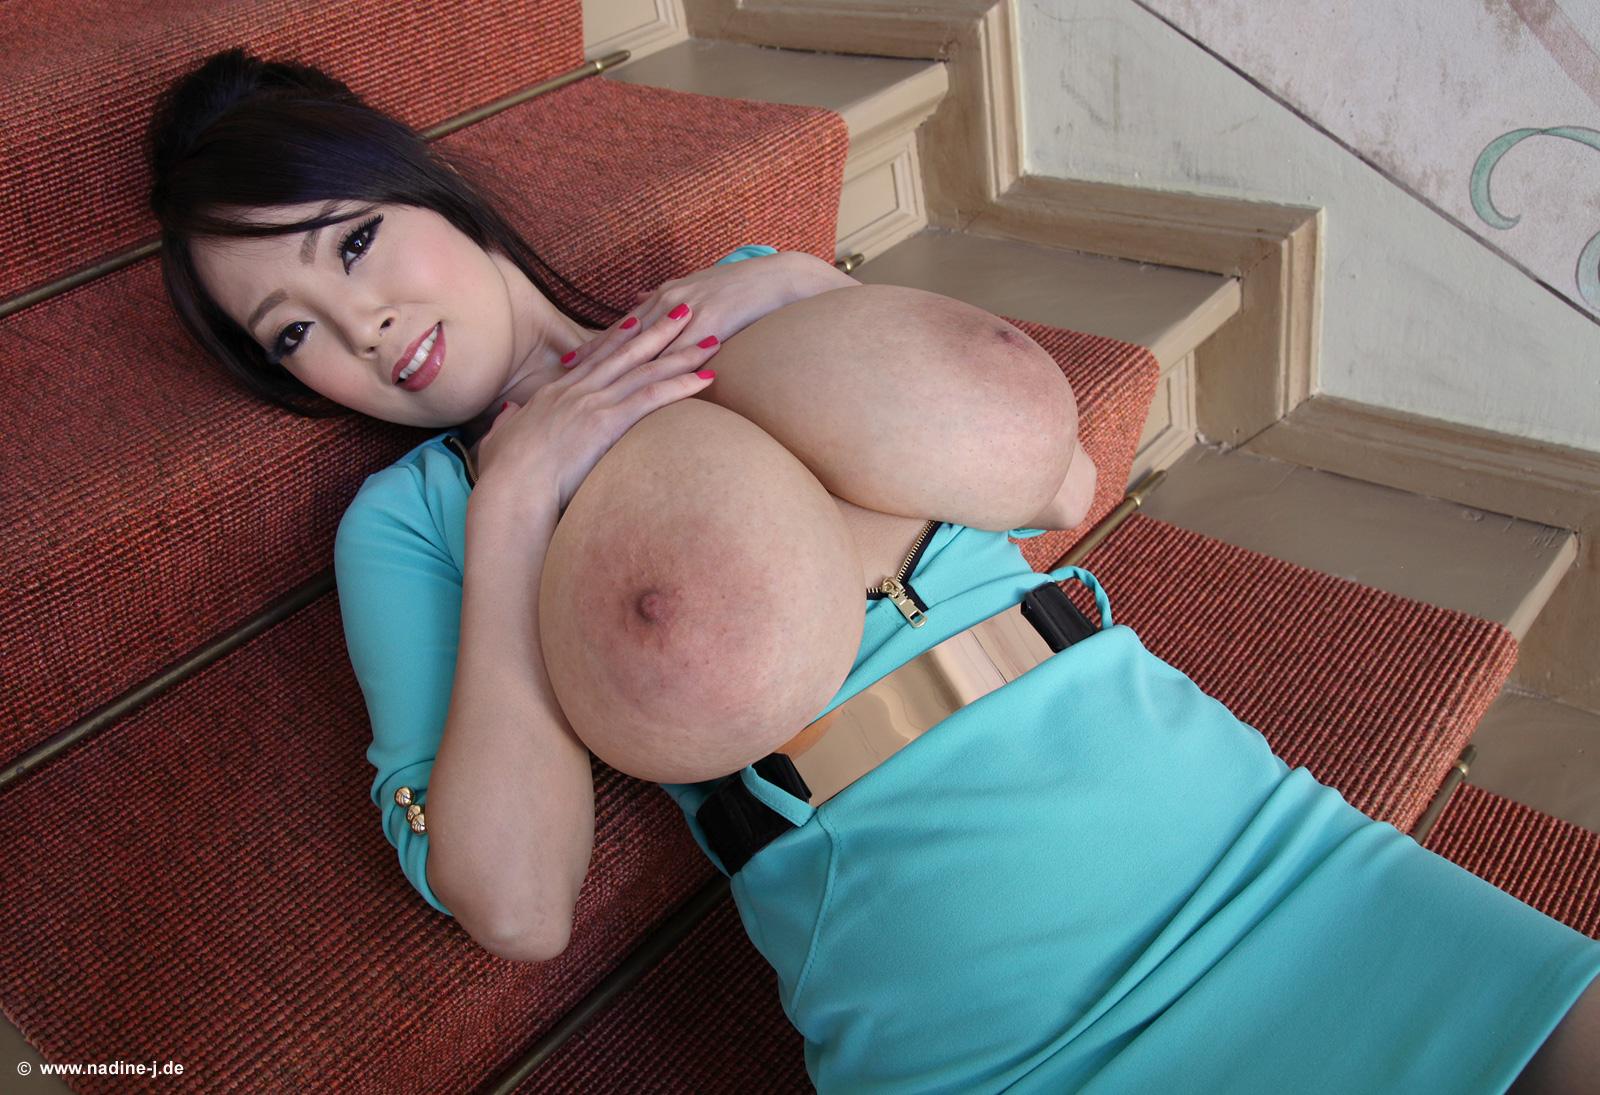 Pan Picks: Top 10 Hitomi Tanaka Videos